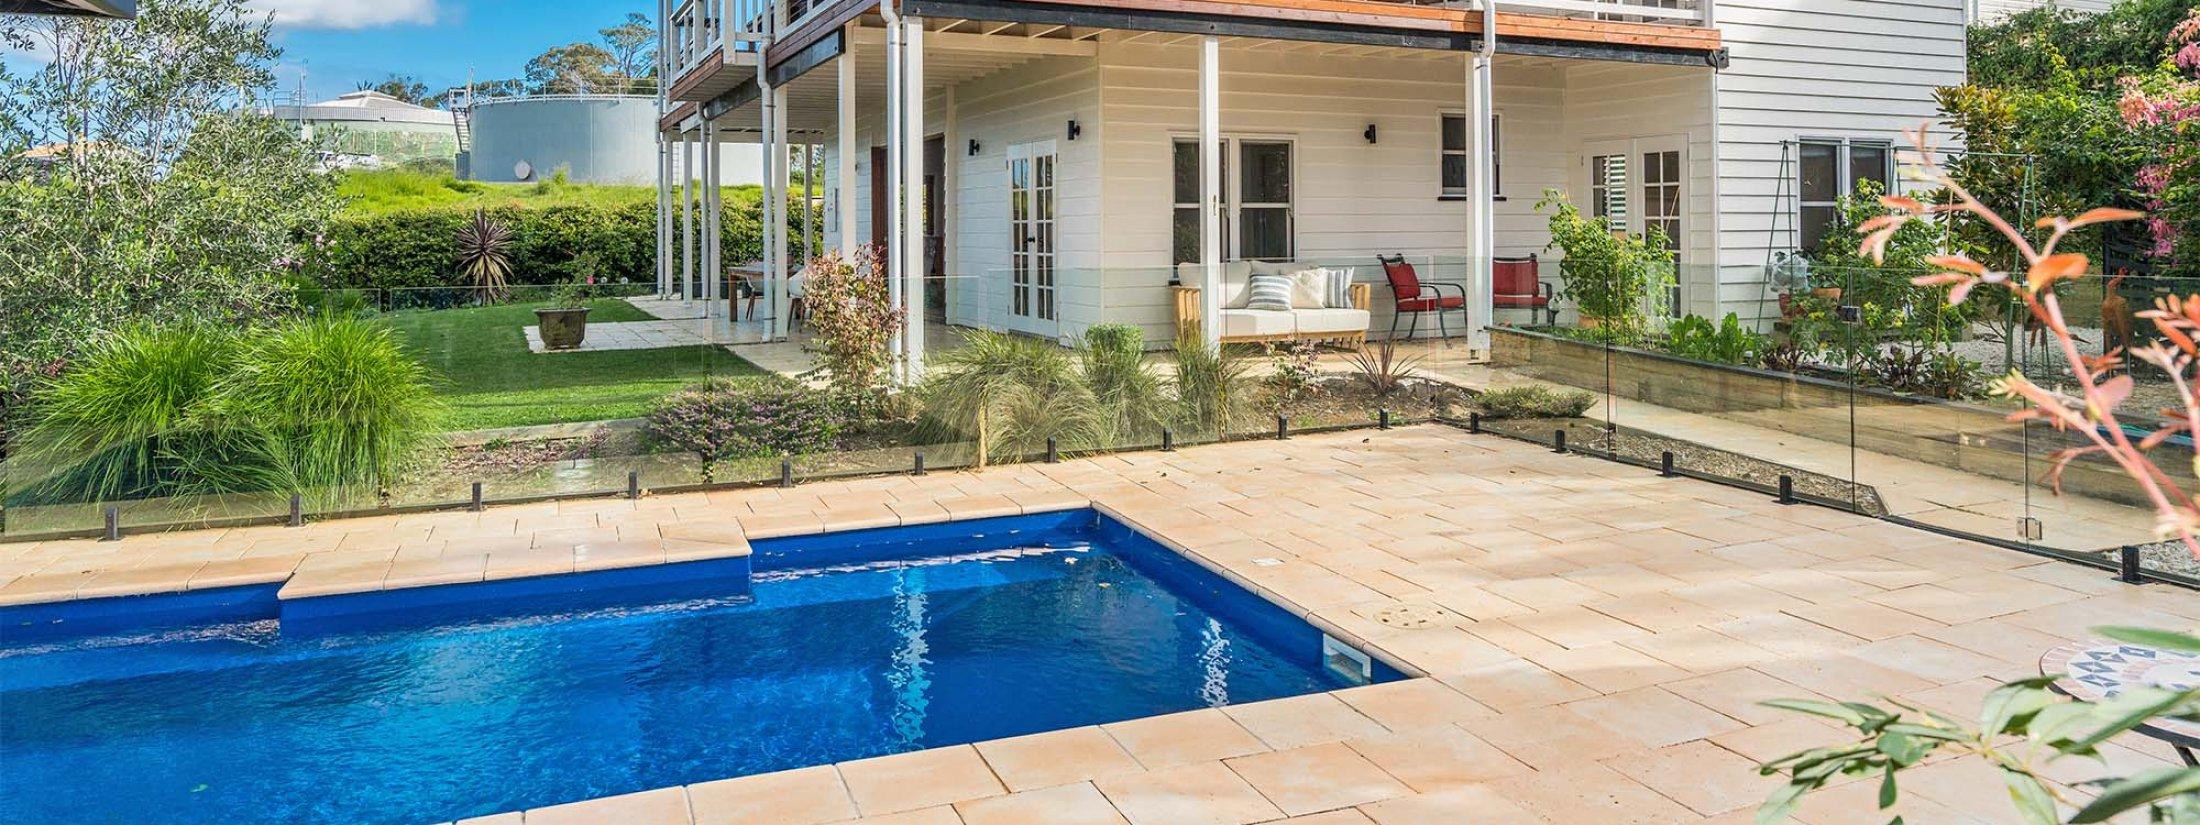 Serenade - Bangalow - Pool and House